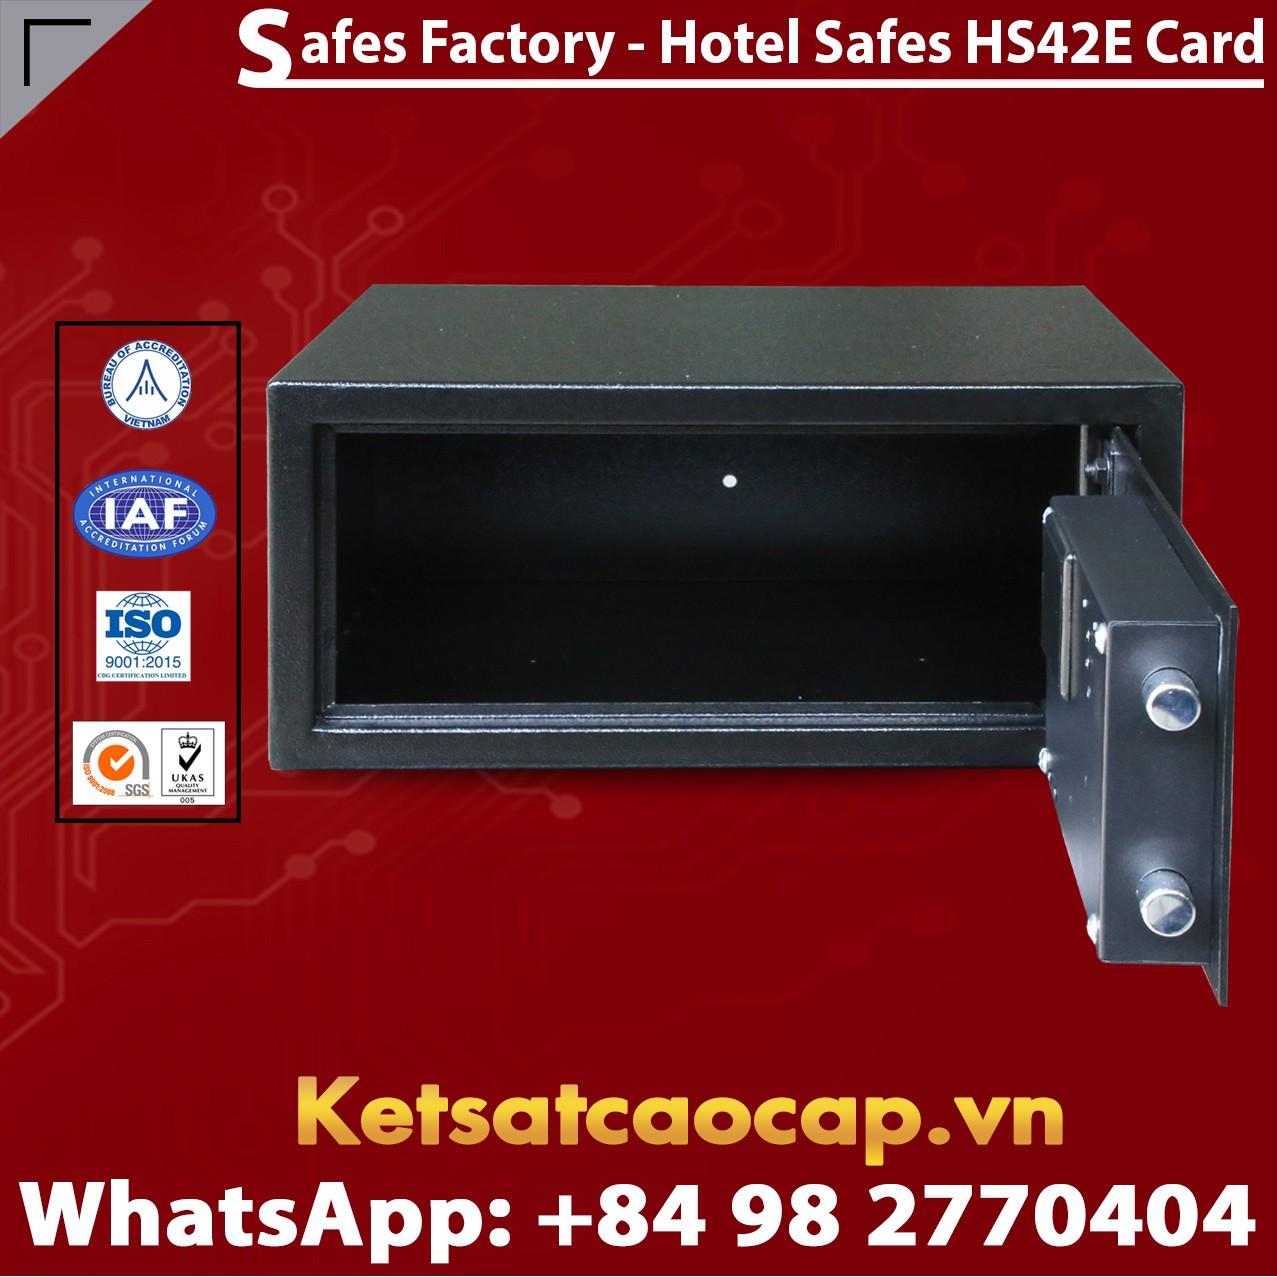 mua két sắt khách sạn welkosafe dưới 5 triệu tốt nhất